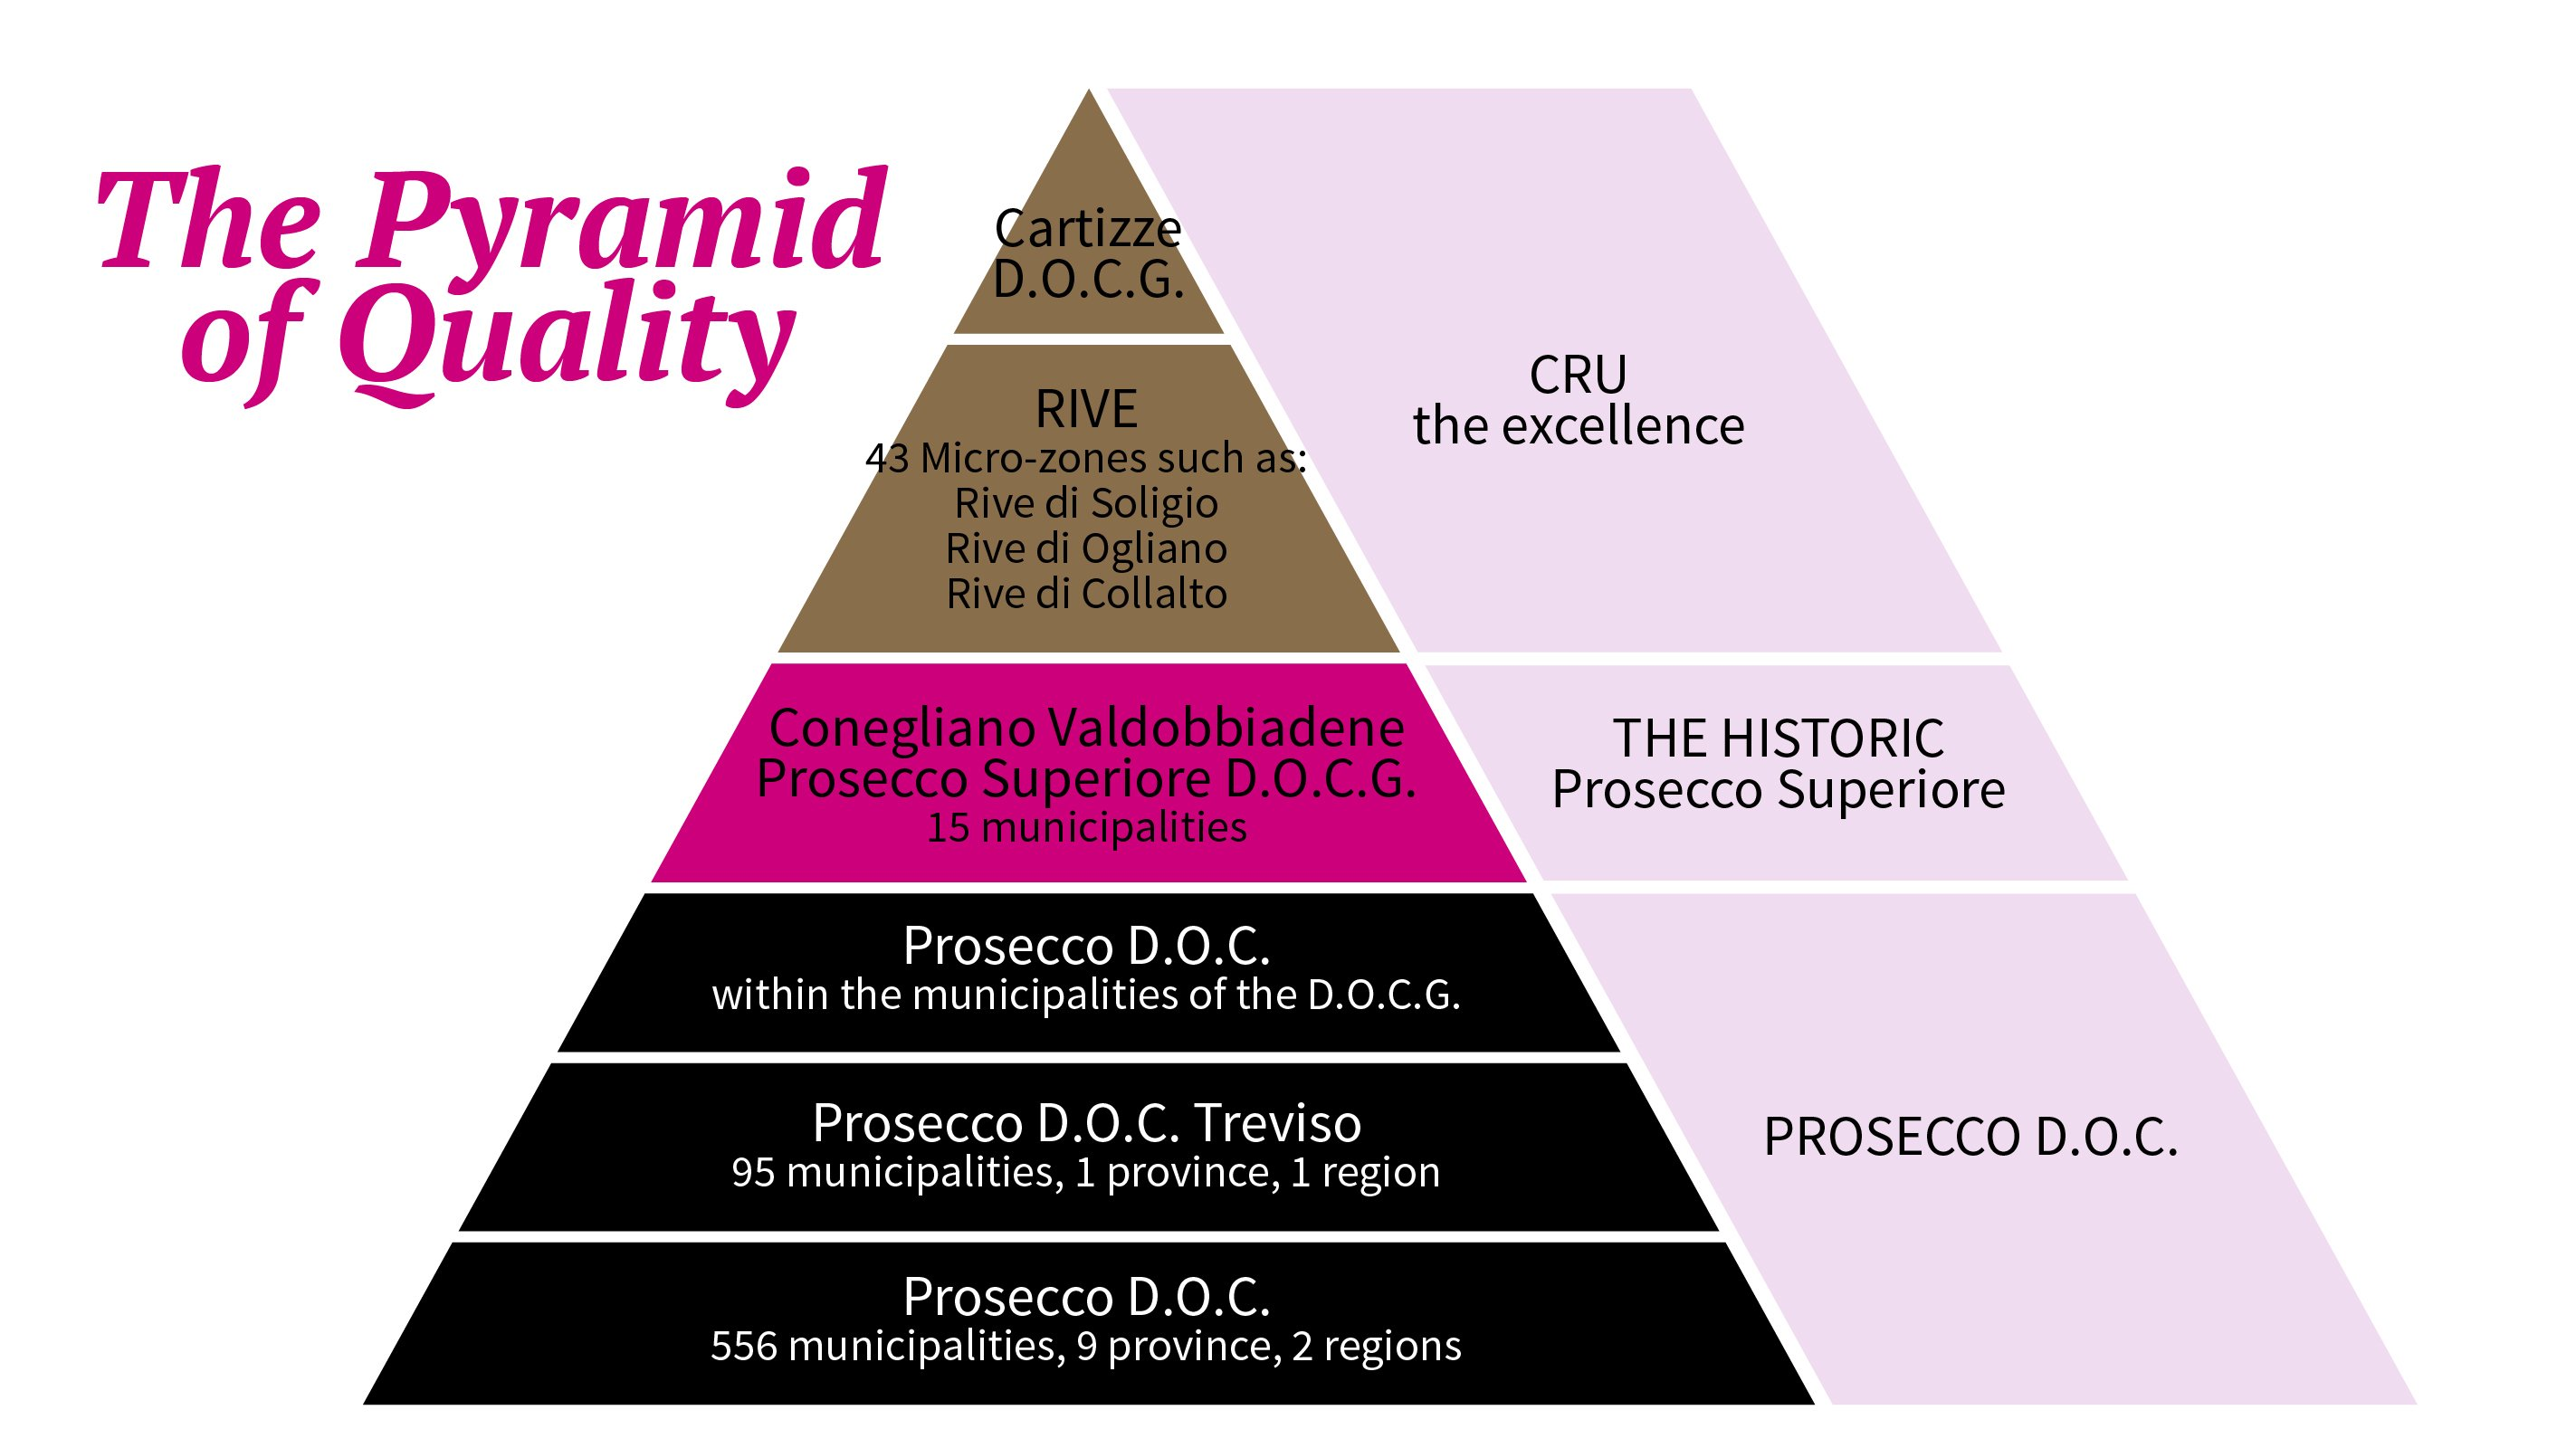 Pyramid of quality